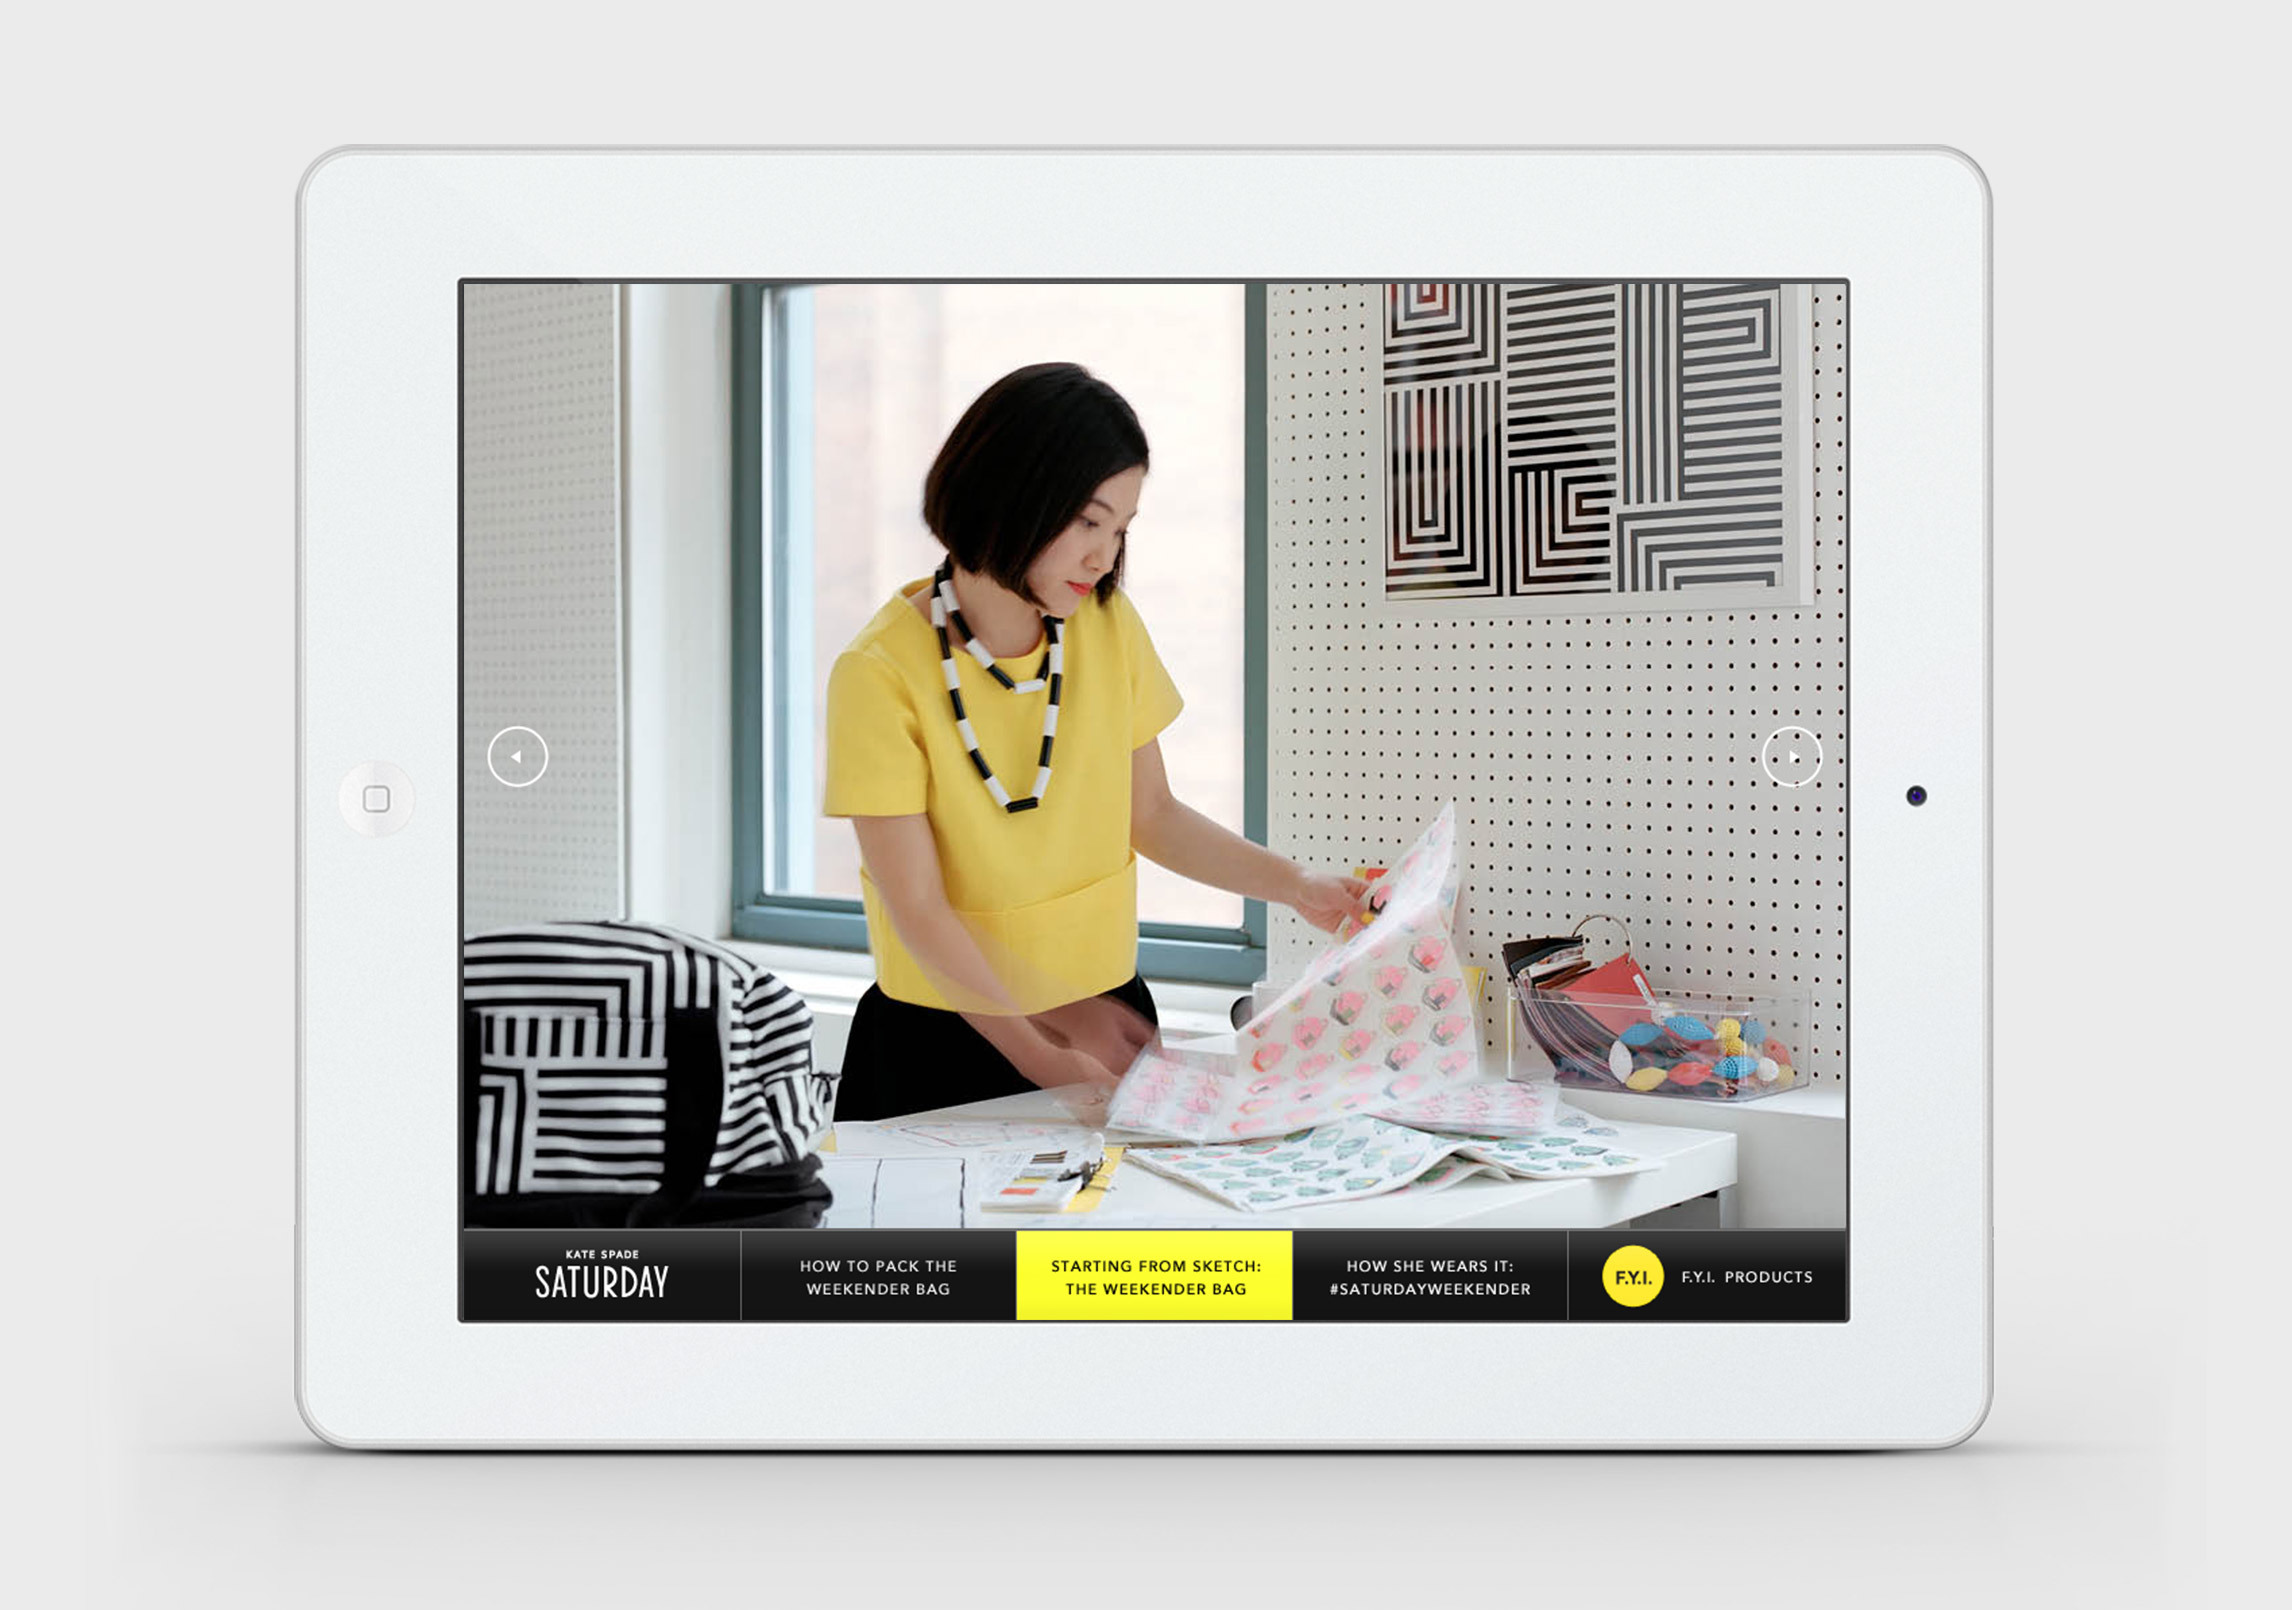 KSS_iPad_03.jpg